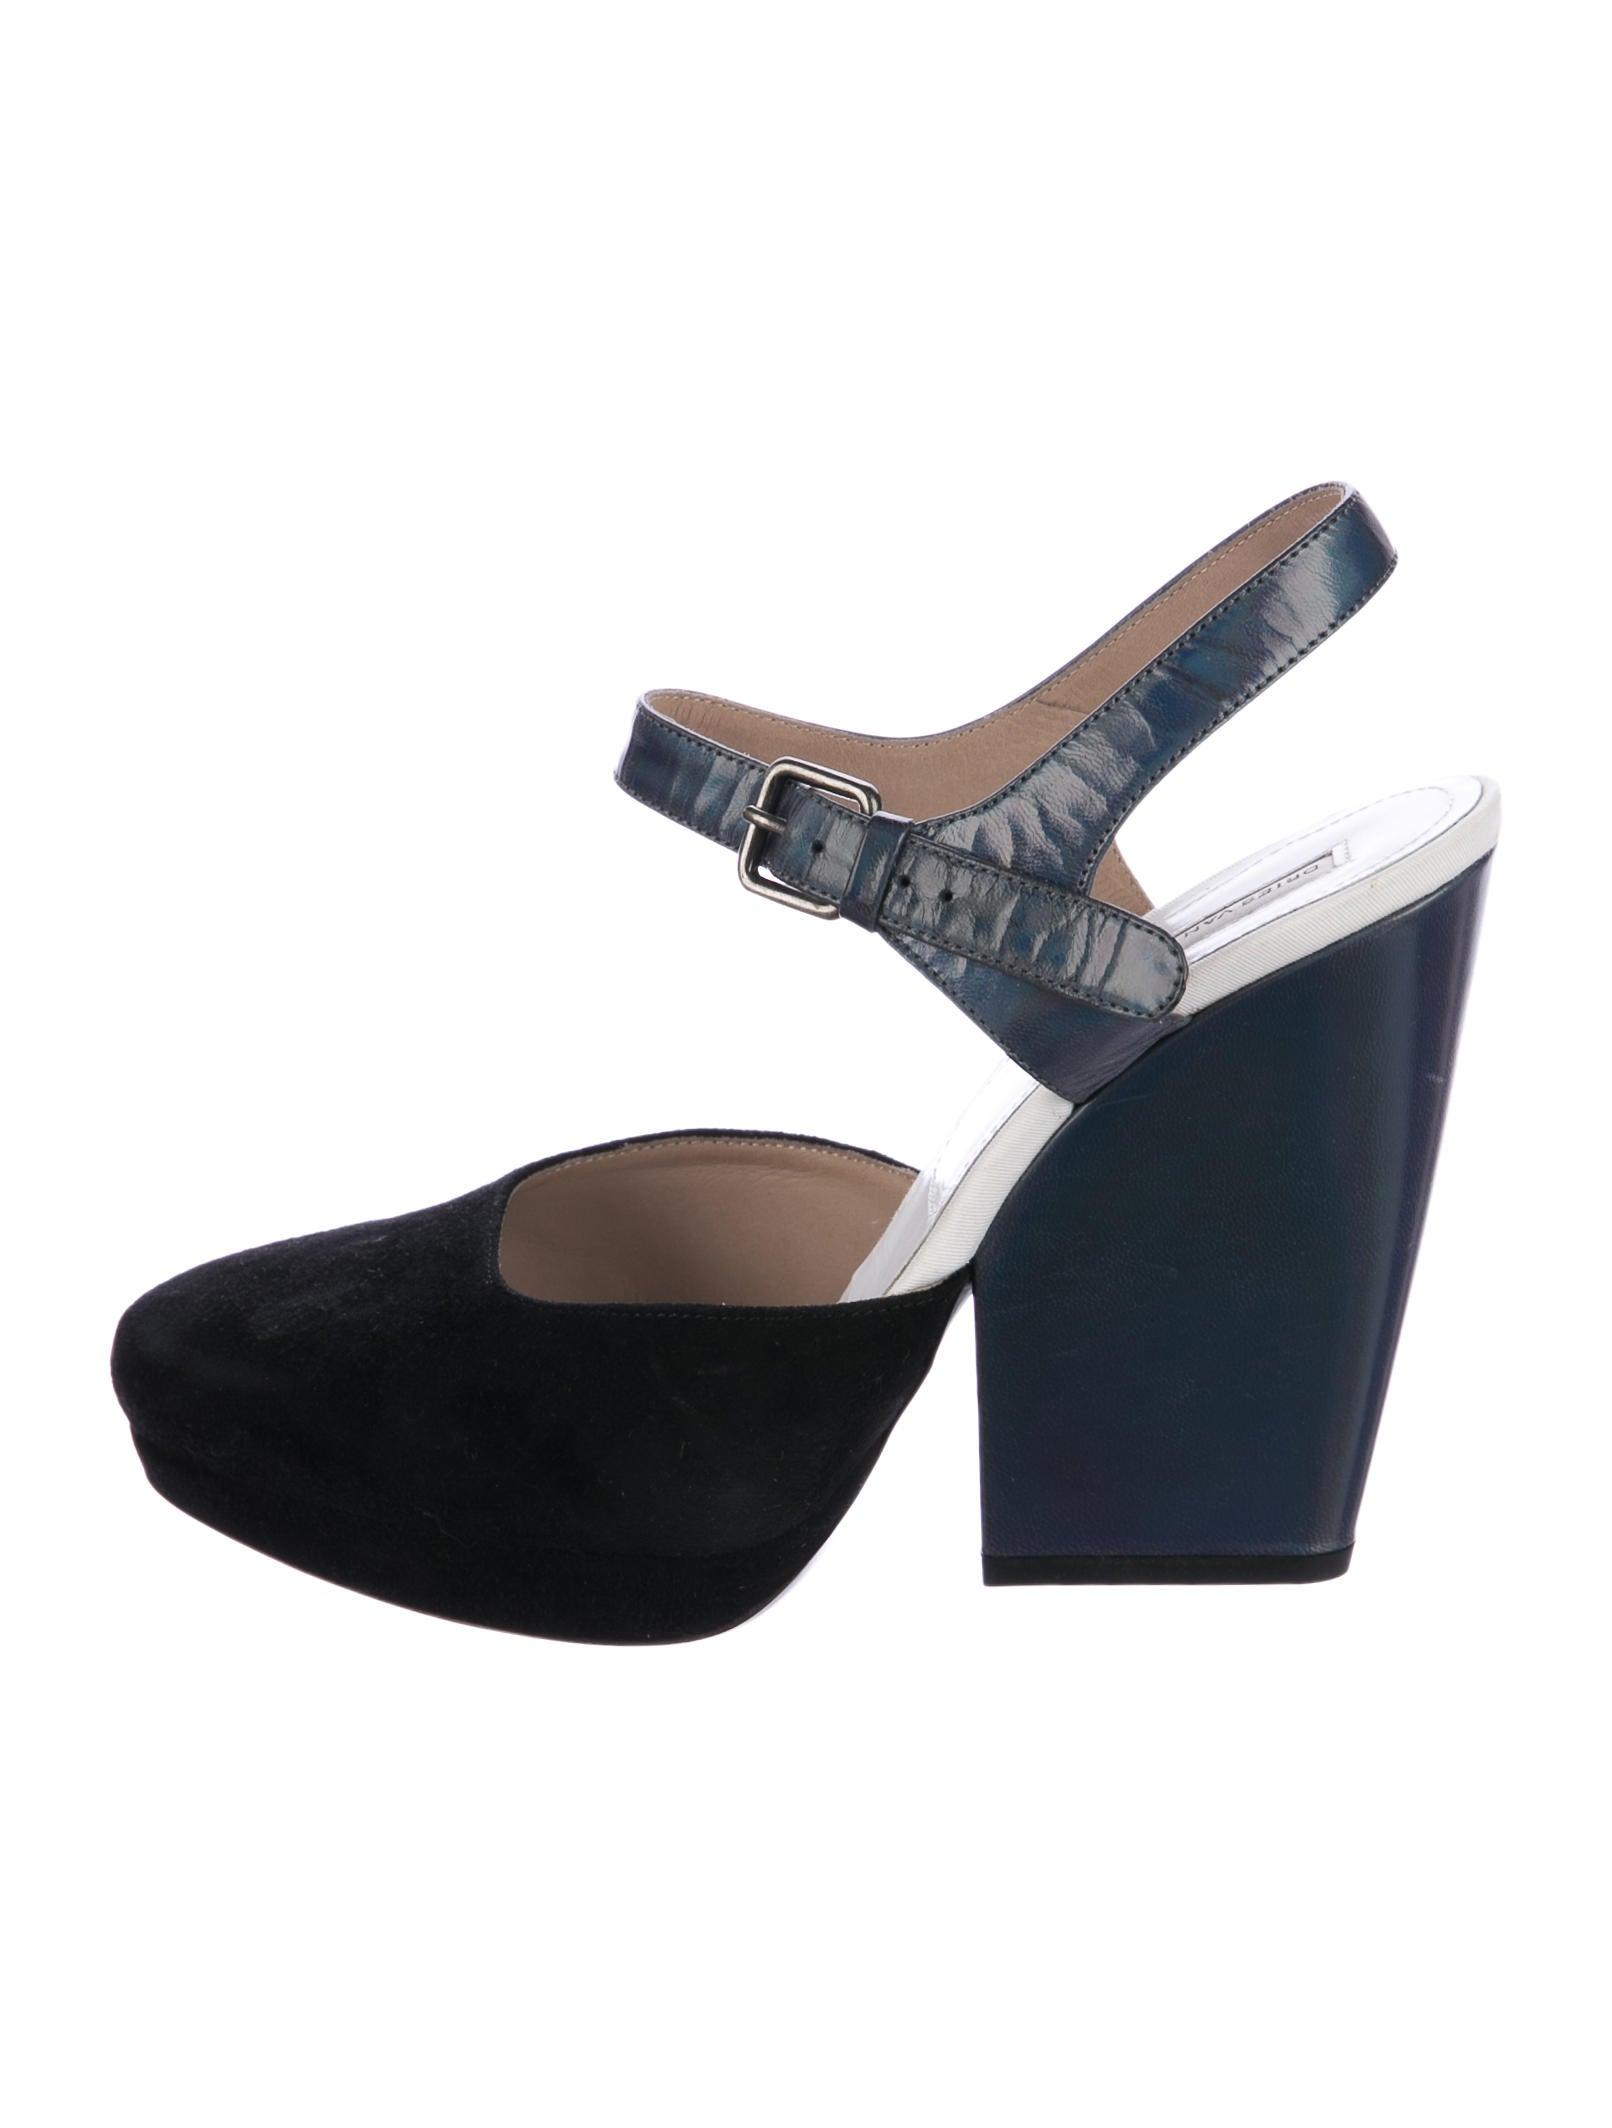 Dries Van Noten Suede Holographic Sandals cheap sale largest supplier great deals discount codes shopping online YlChBtMye